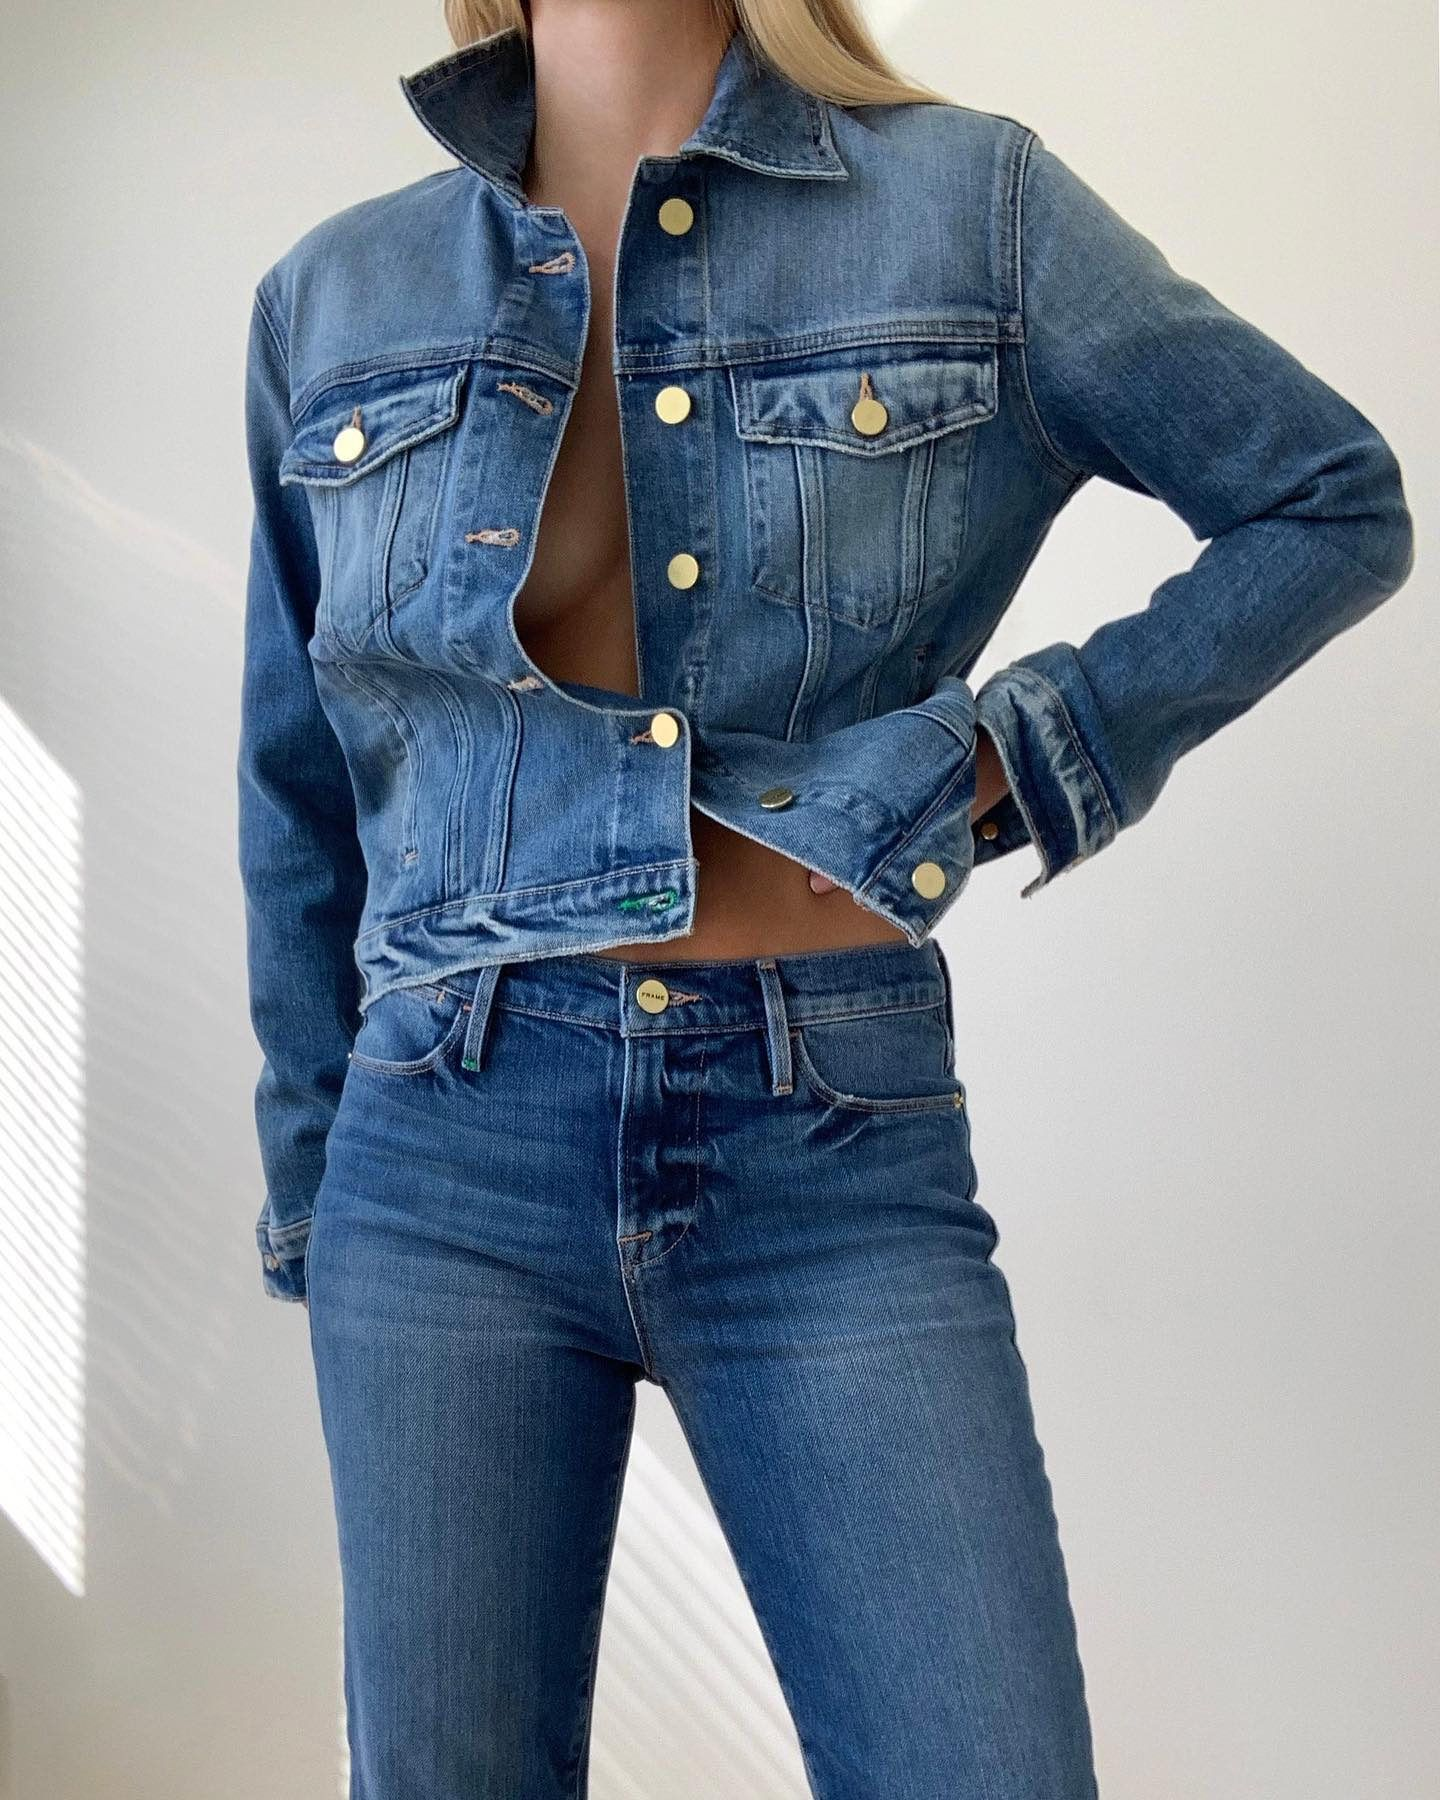 Frame Sustainable Denim In 2020 Blouse Outfit Denim Vintage Jacket